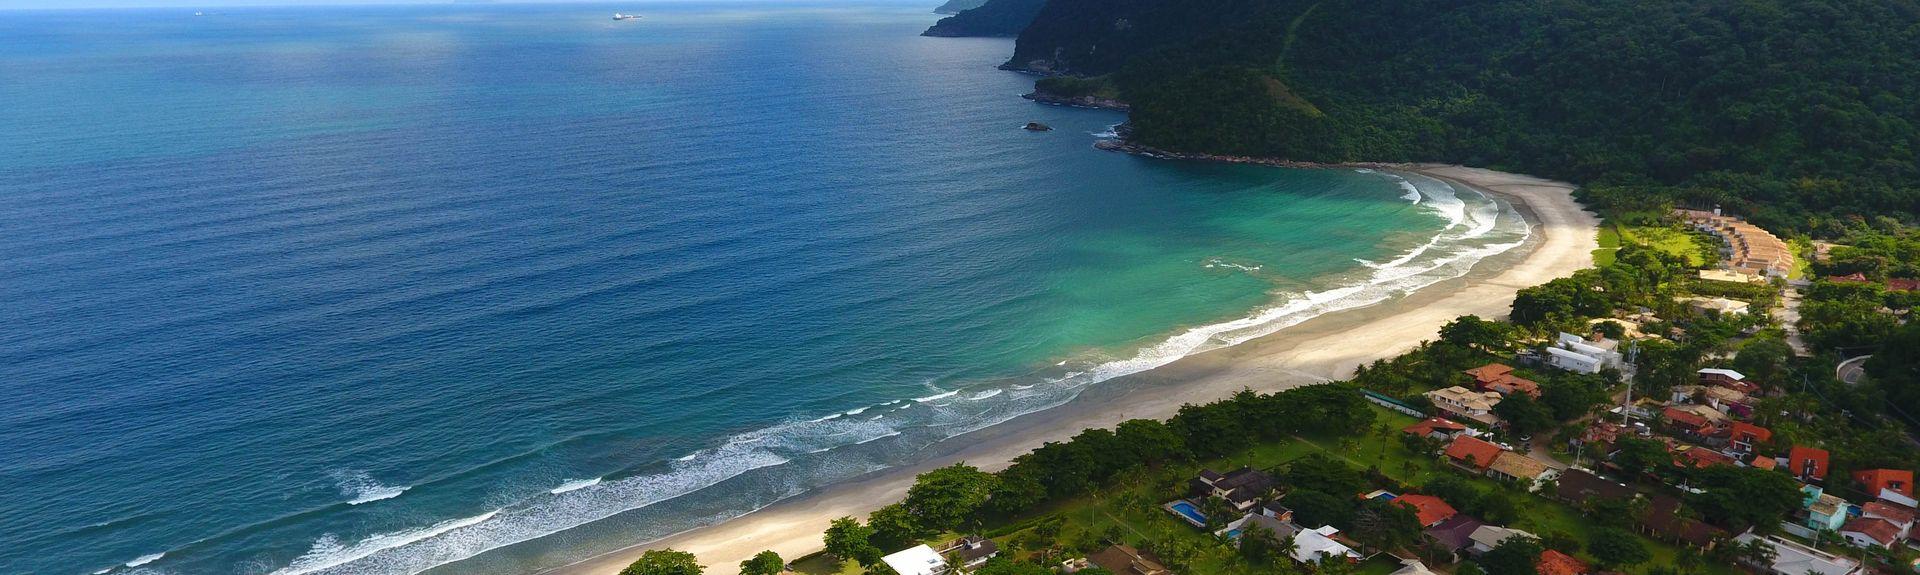 Playa de Guaeca, Sao Sebastiao, Sudeste (región), Brasil